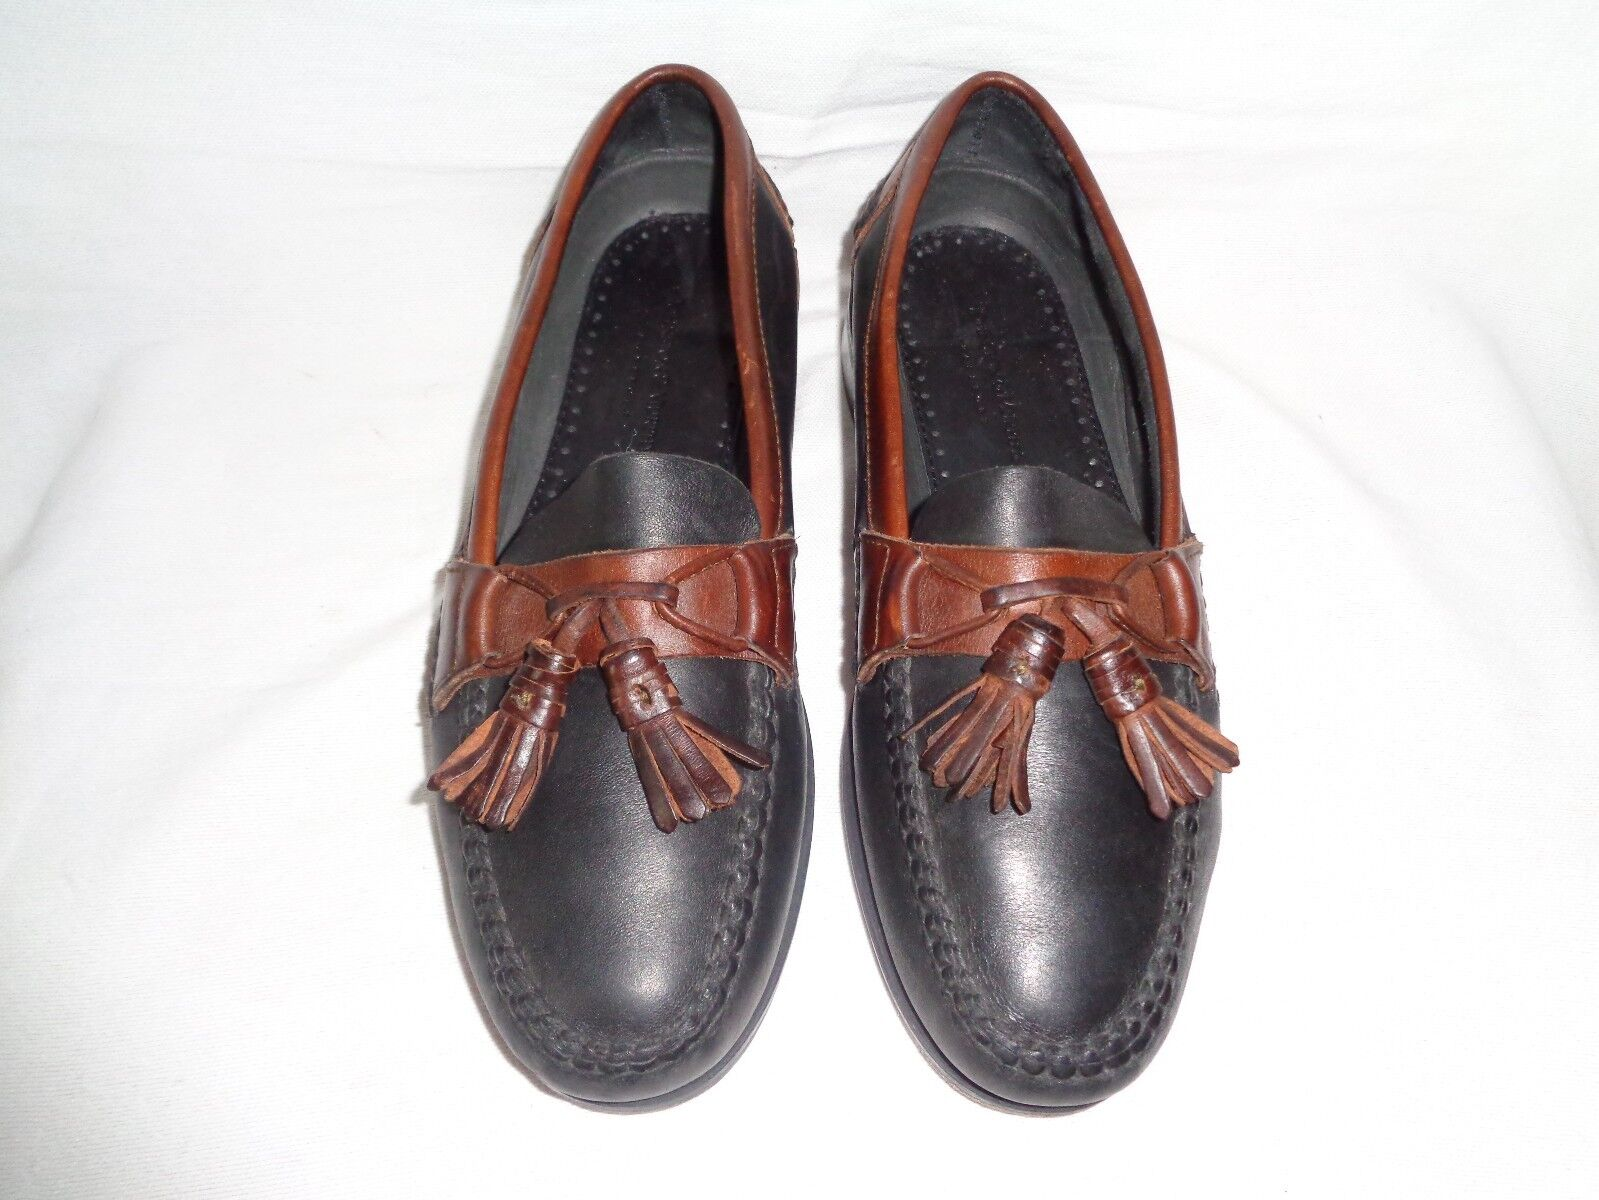 Johnston & Murphy Passport Black Brown Tassel Loafer Men's Size US 8.5 M